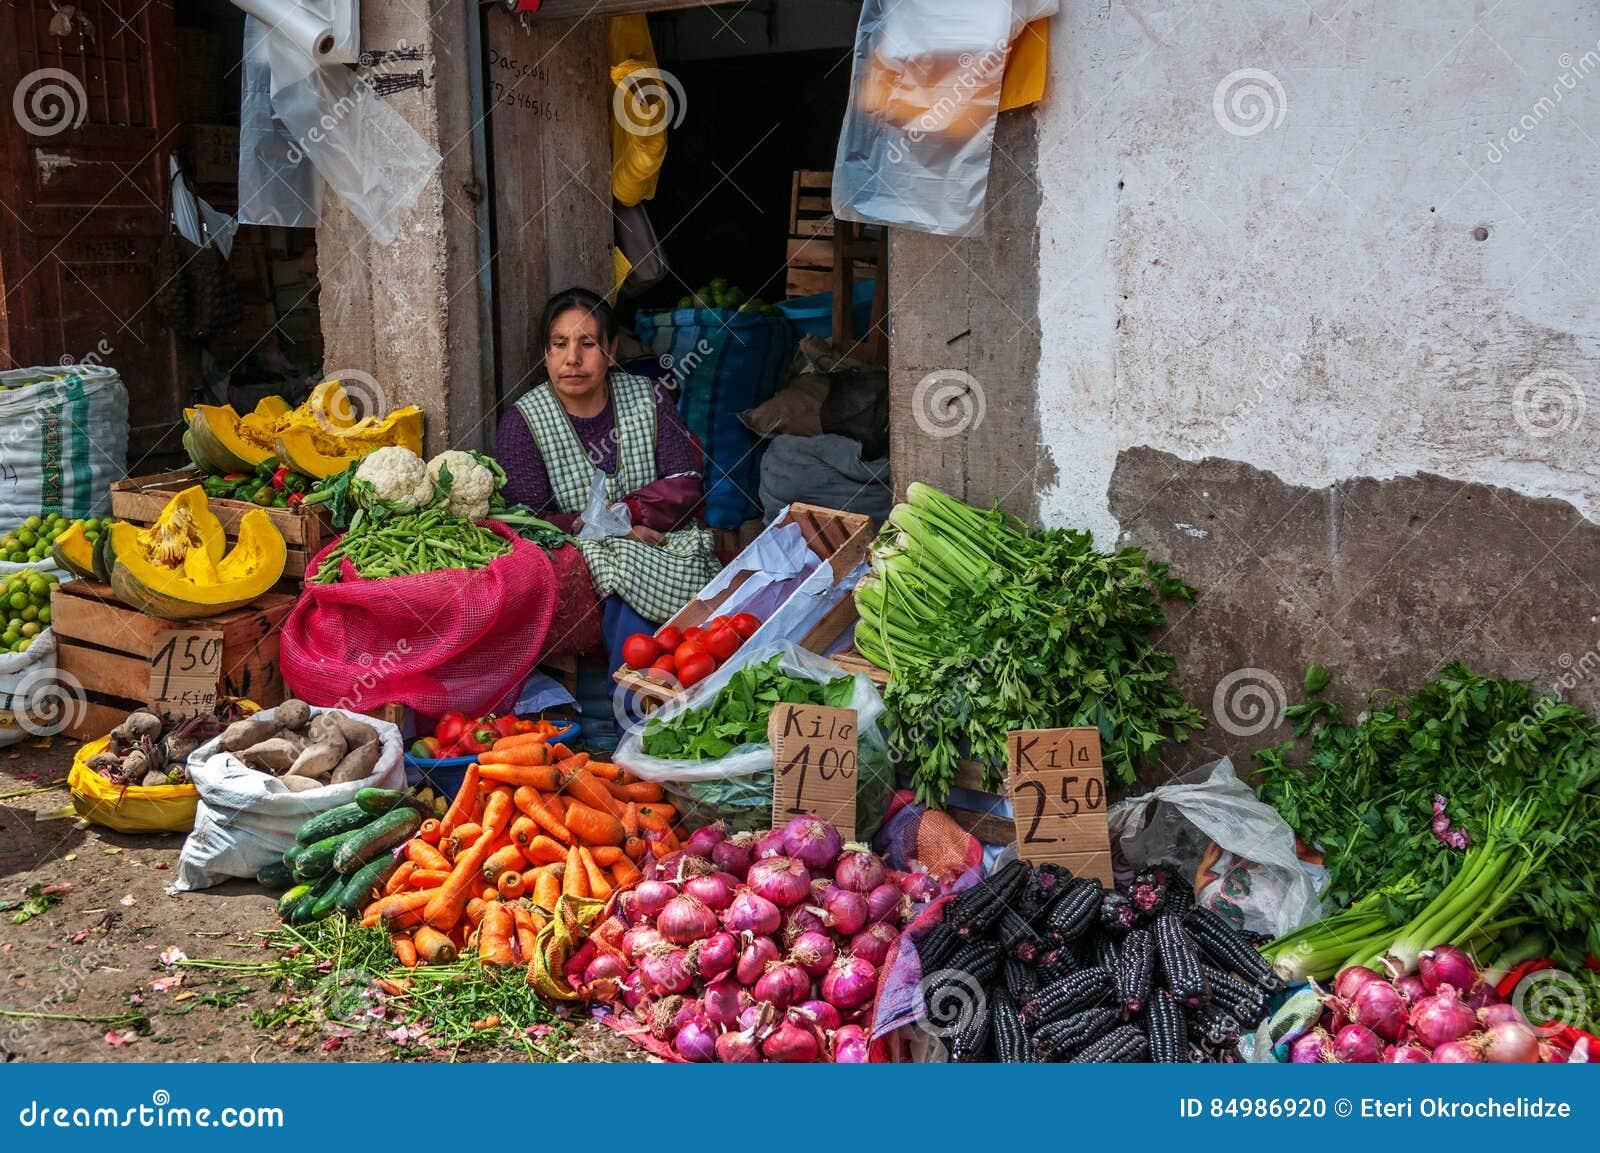 CUSCO, PERU - OCTOBER 8, 2016: Latin American Woman Sells ...